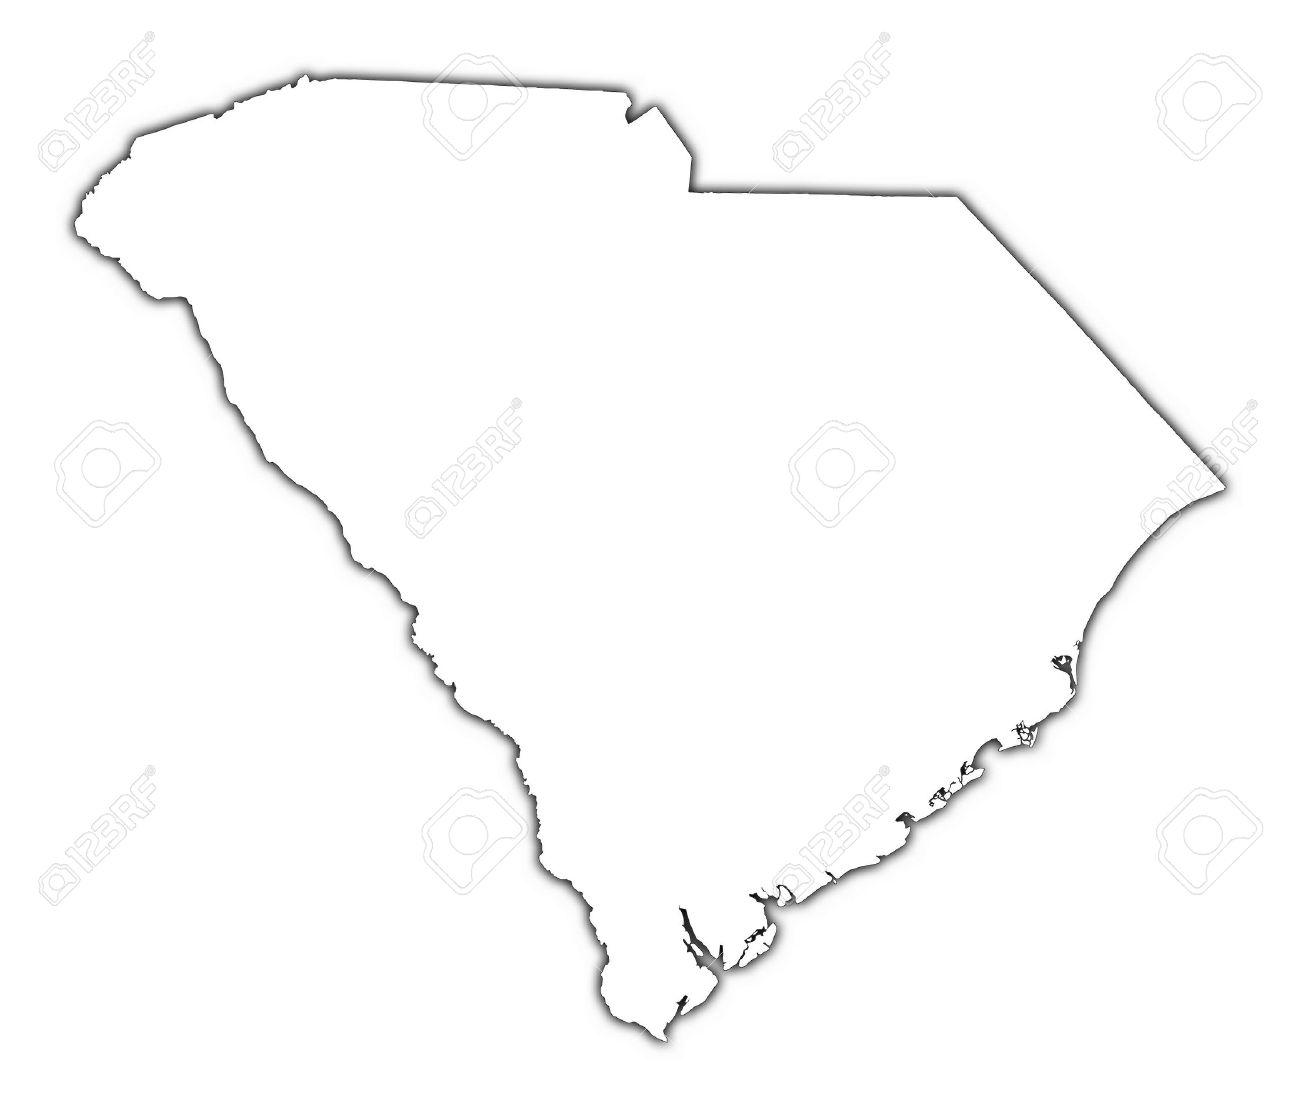 South Carolina Usa Outline Map With Shadow Detailed Mercator